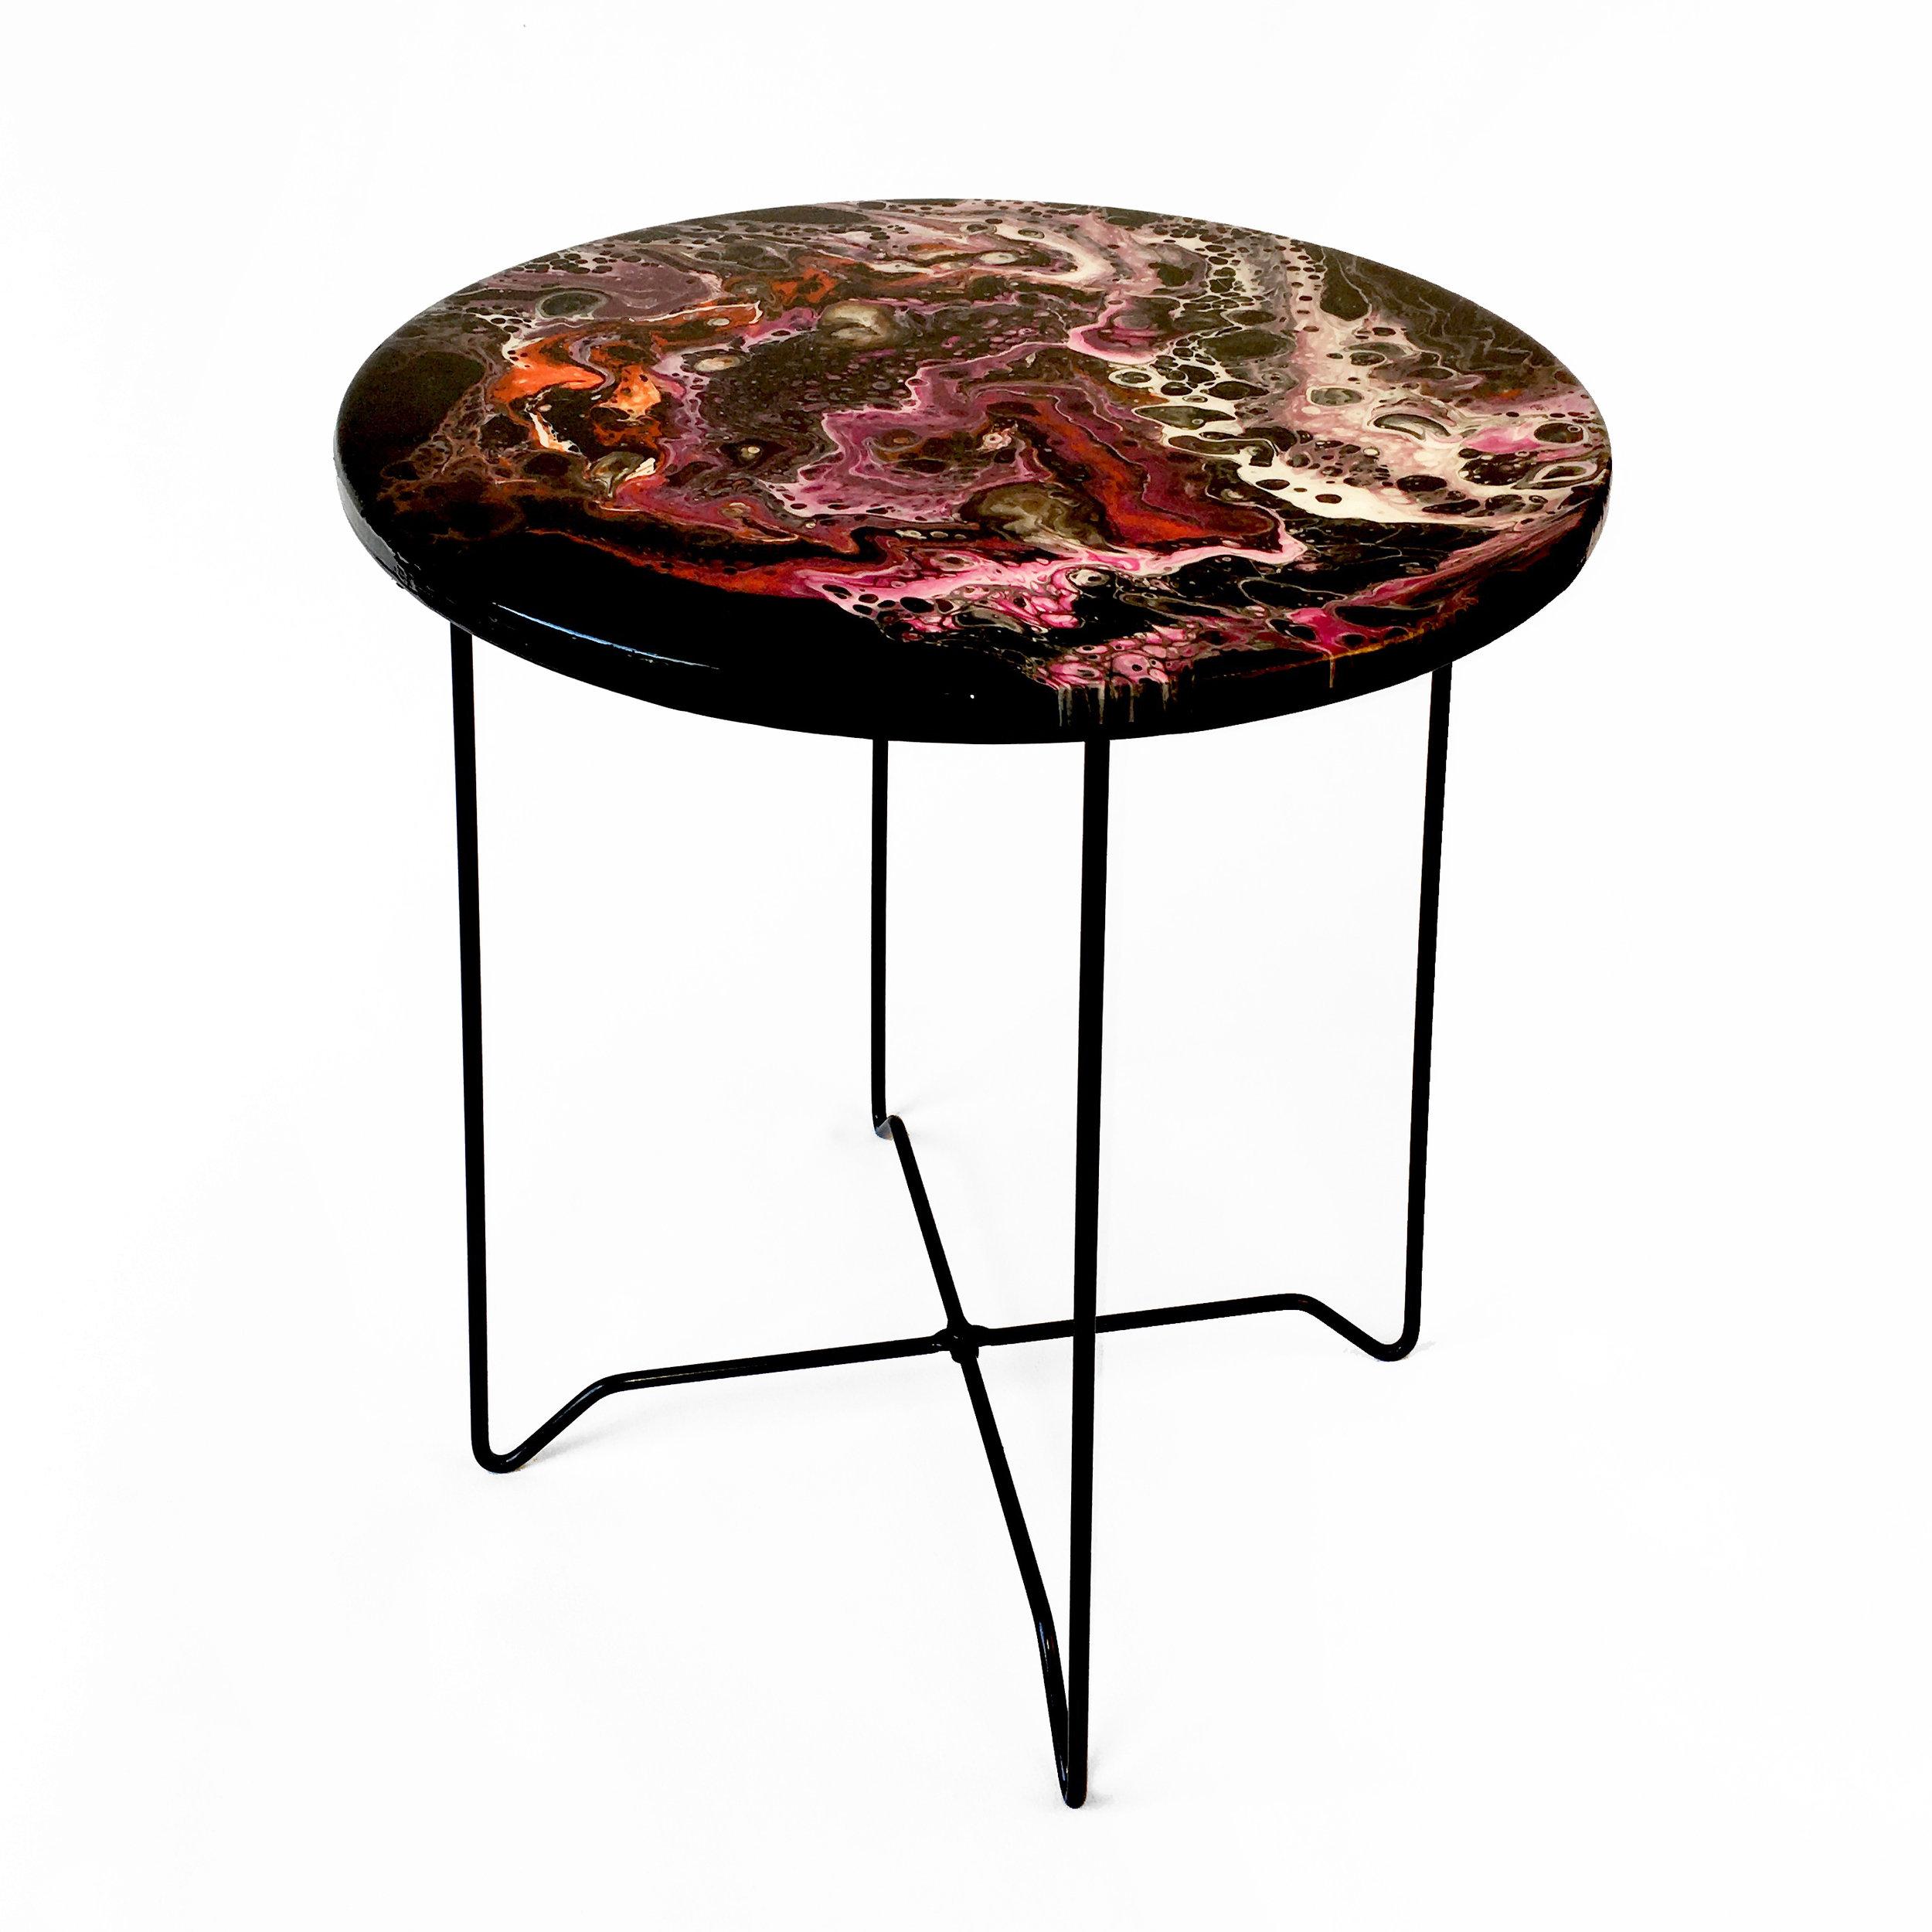 Seraphic Table I.jpg